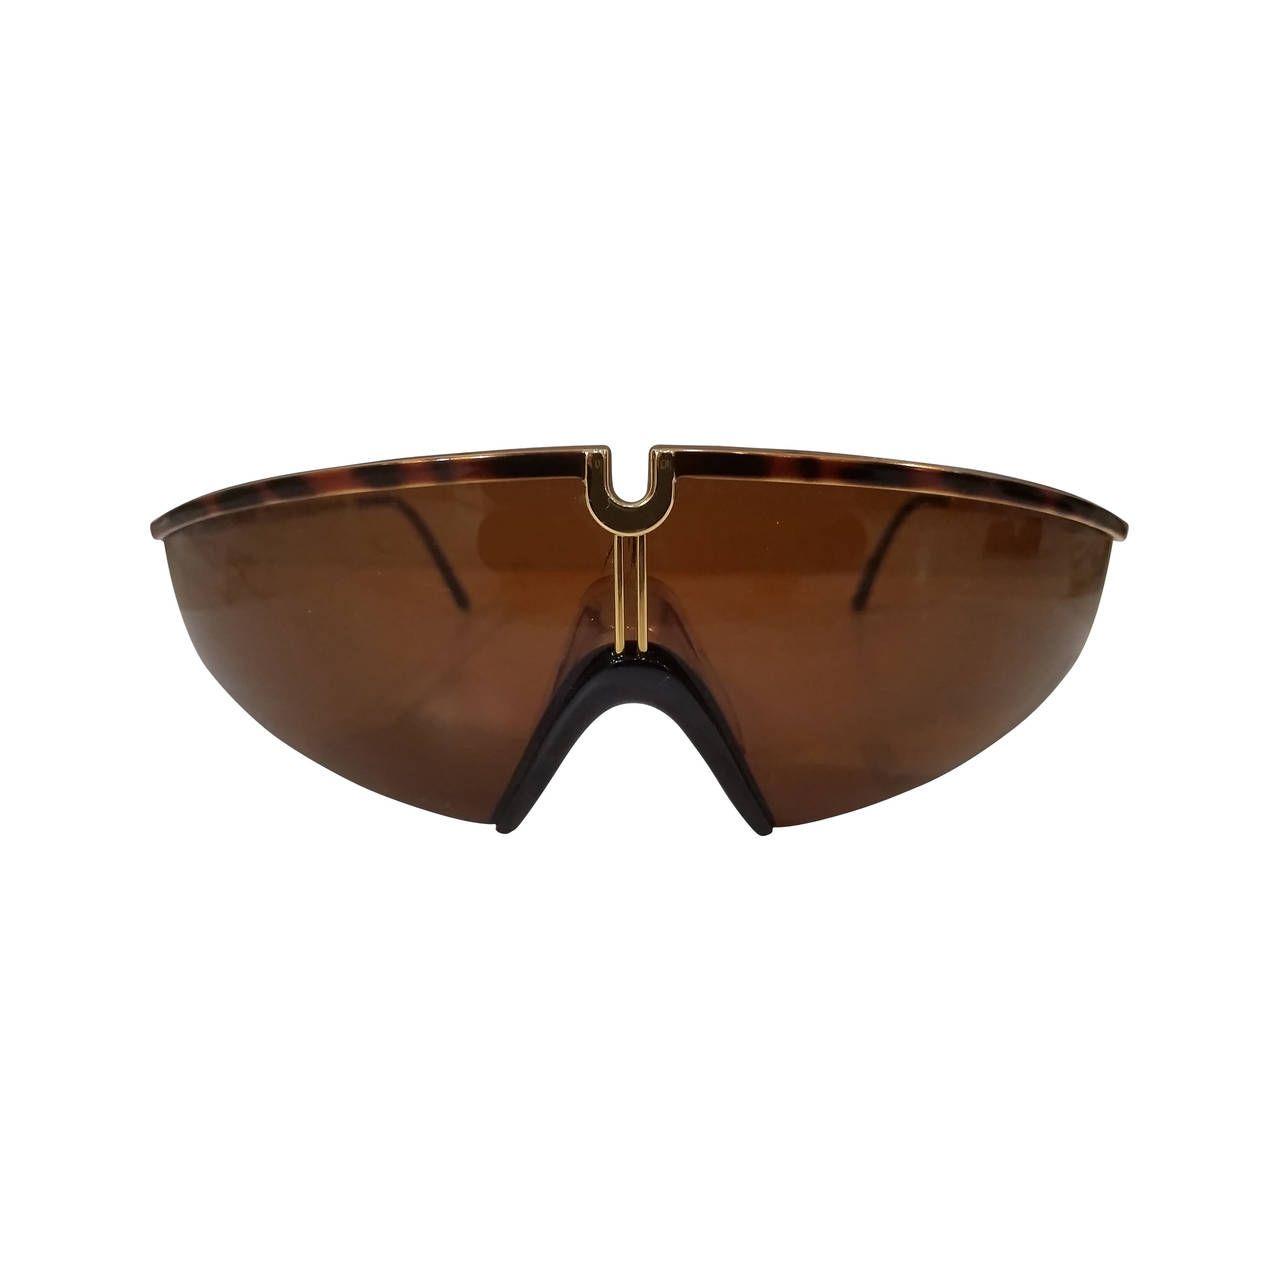 55c7e12db0a5c 1980s Gianni Versace Brown tortoise sunglasses